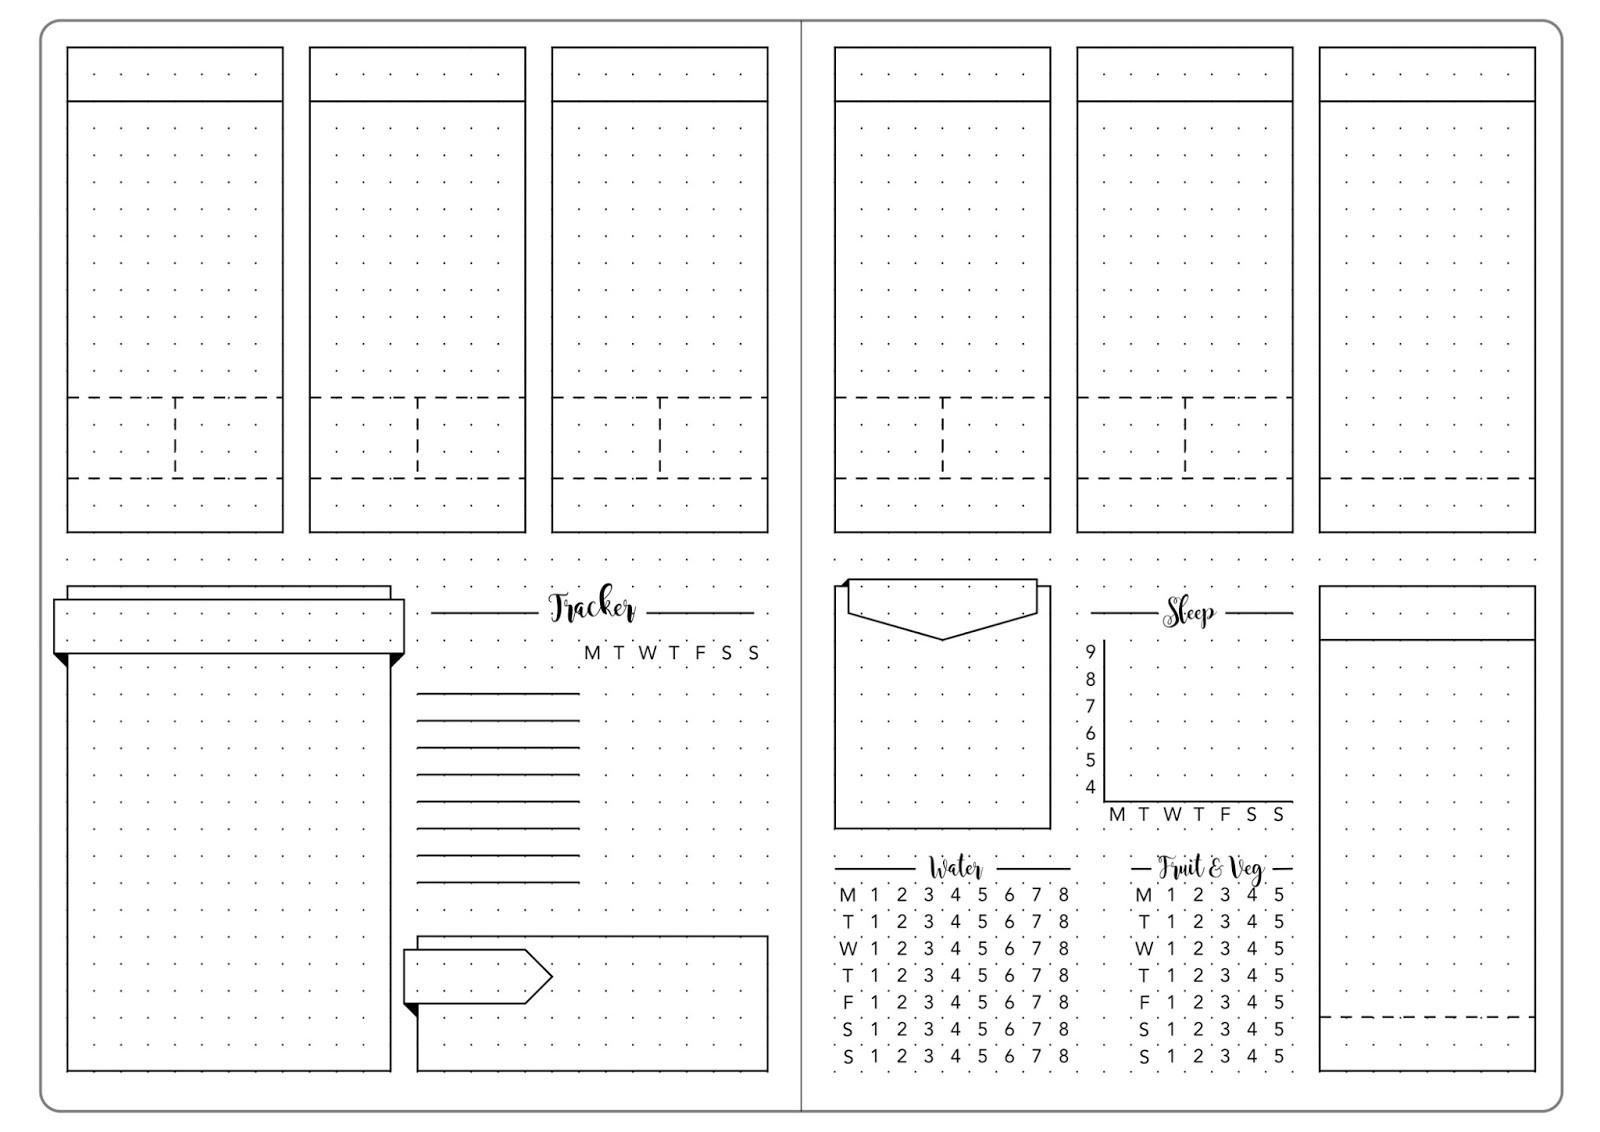 7 habits calendar template  15+ bullet journal vorlagen | car2 go events - 7 habits calendar template